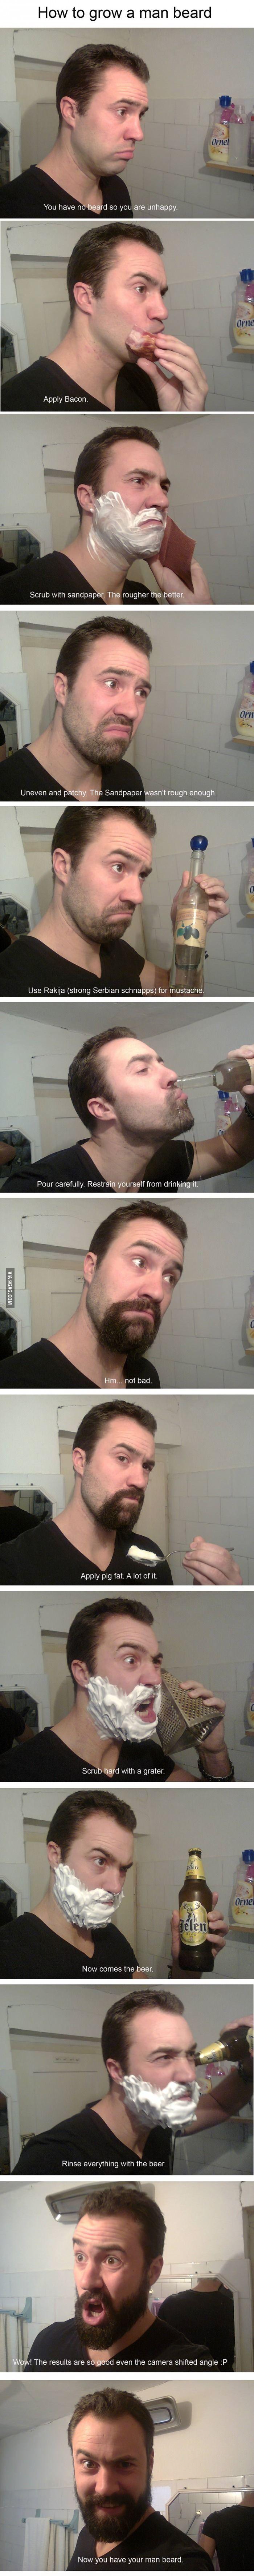 How to grow a man beard.